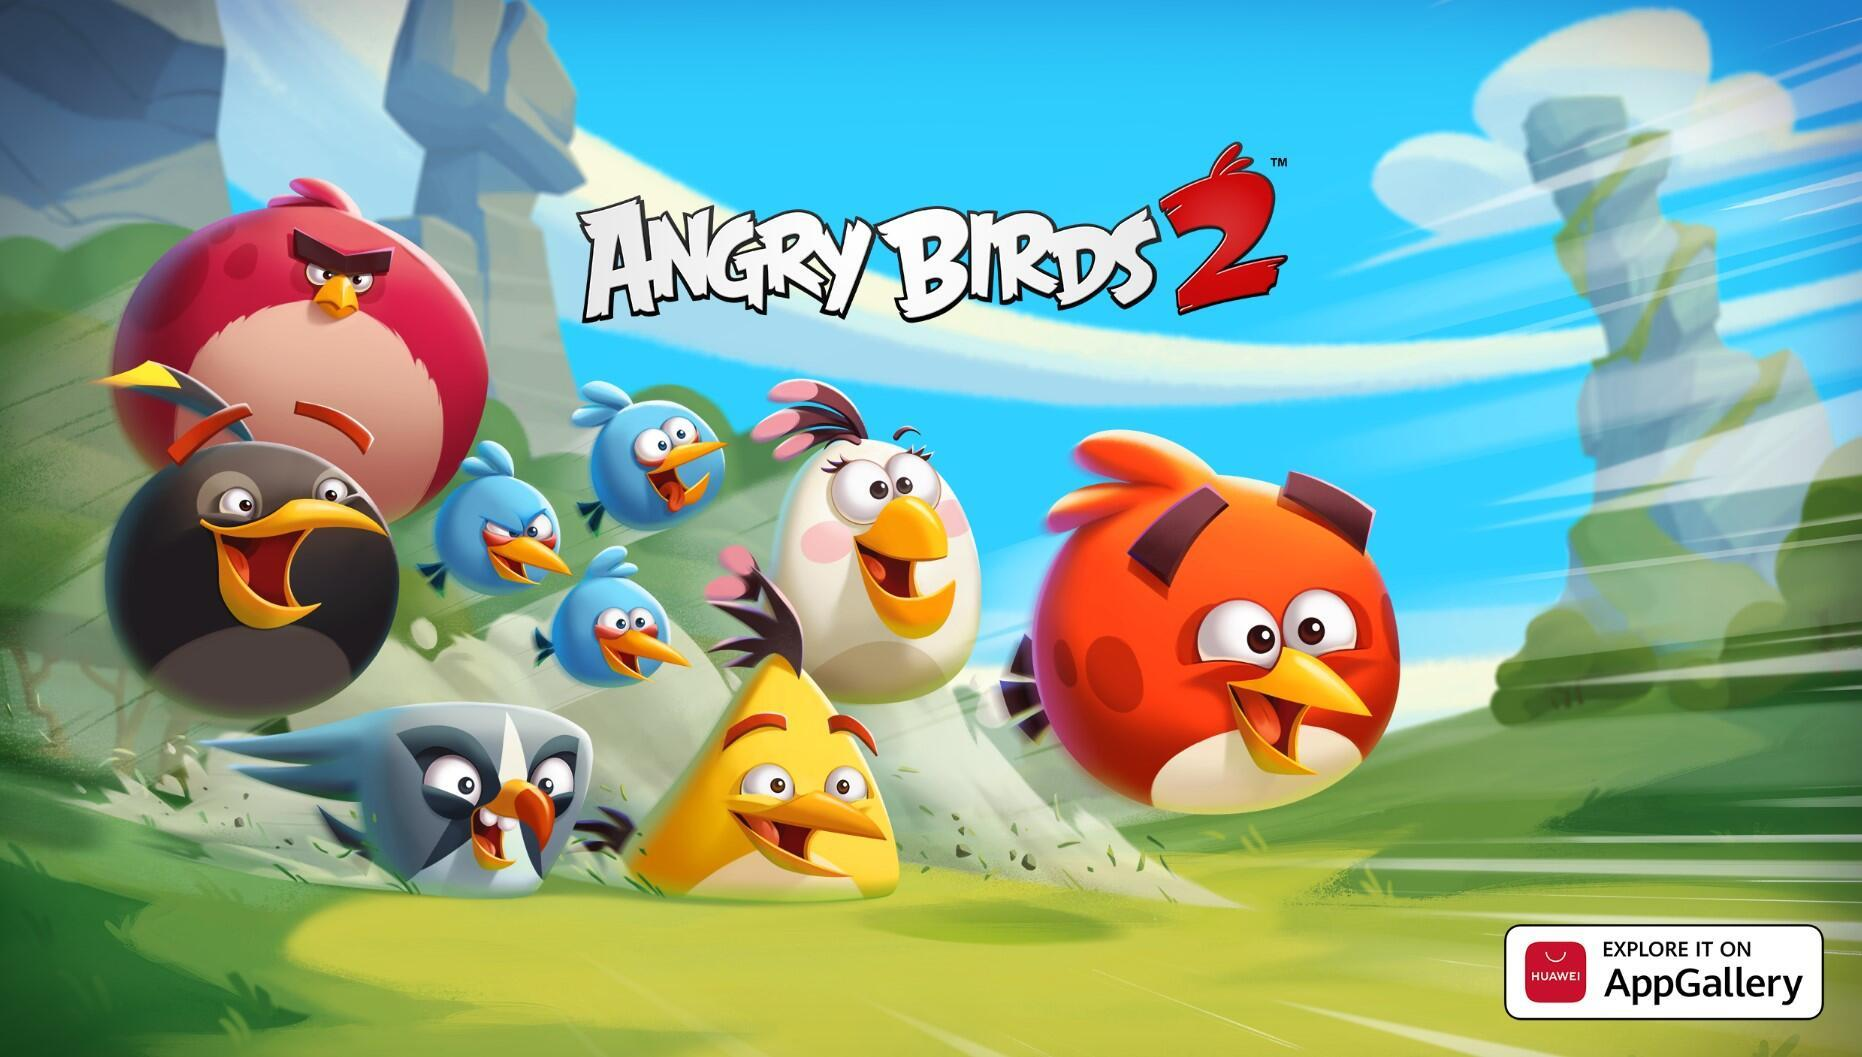 Angry Birds 2 artık AppGallery'de